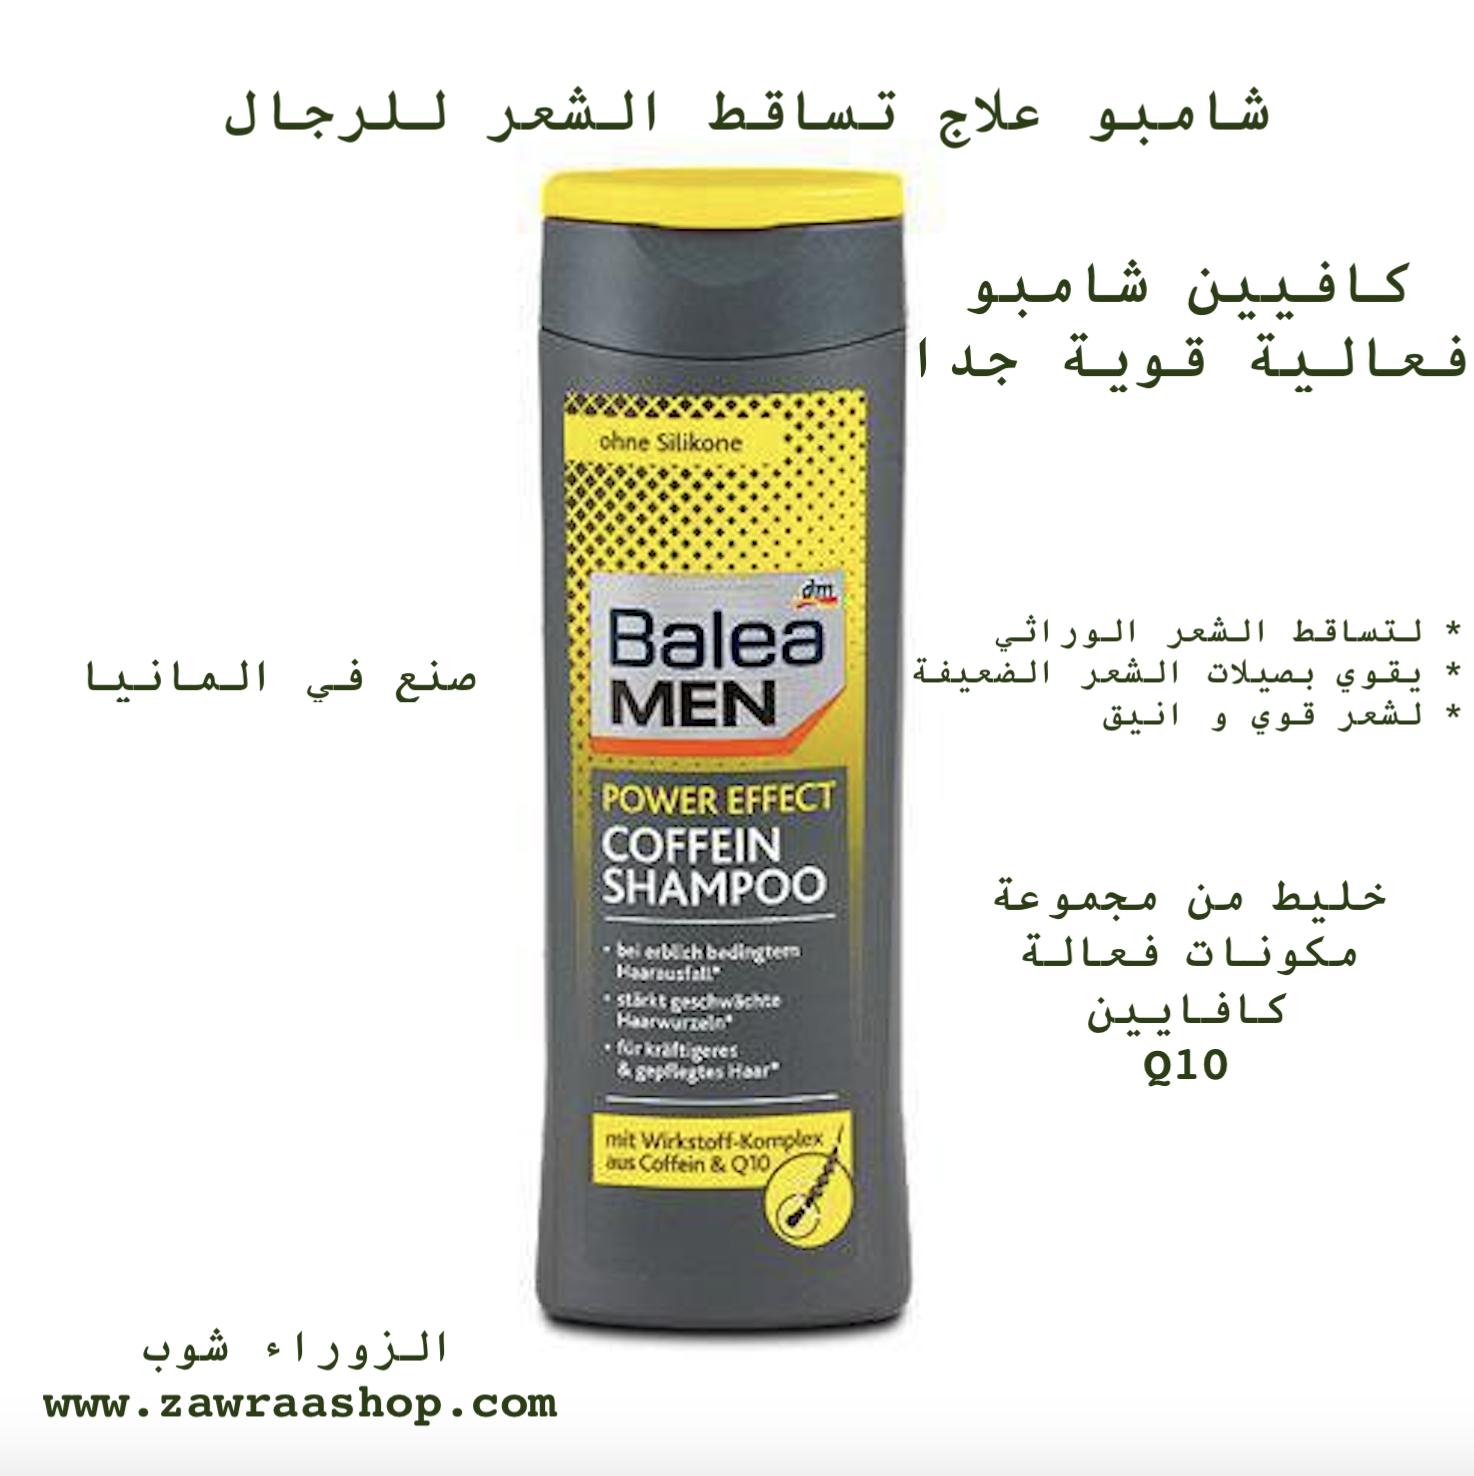 B404 men Coffein Shampoo 250ml شامبو رجالي ضد التساقط